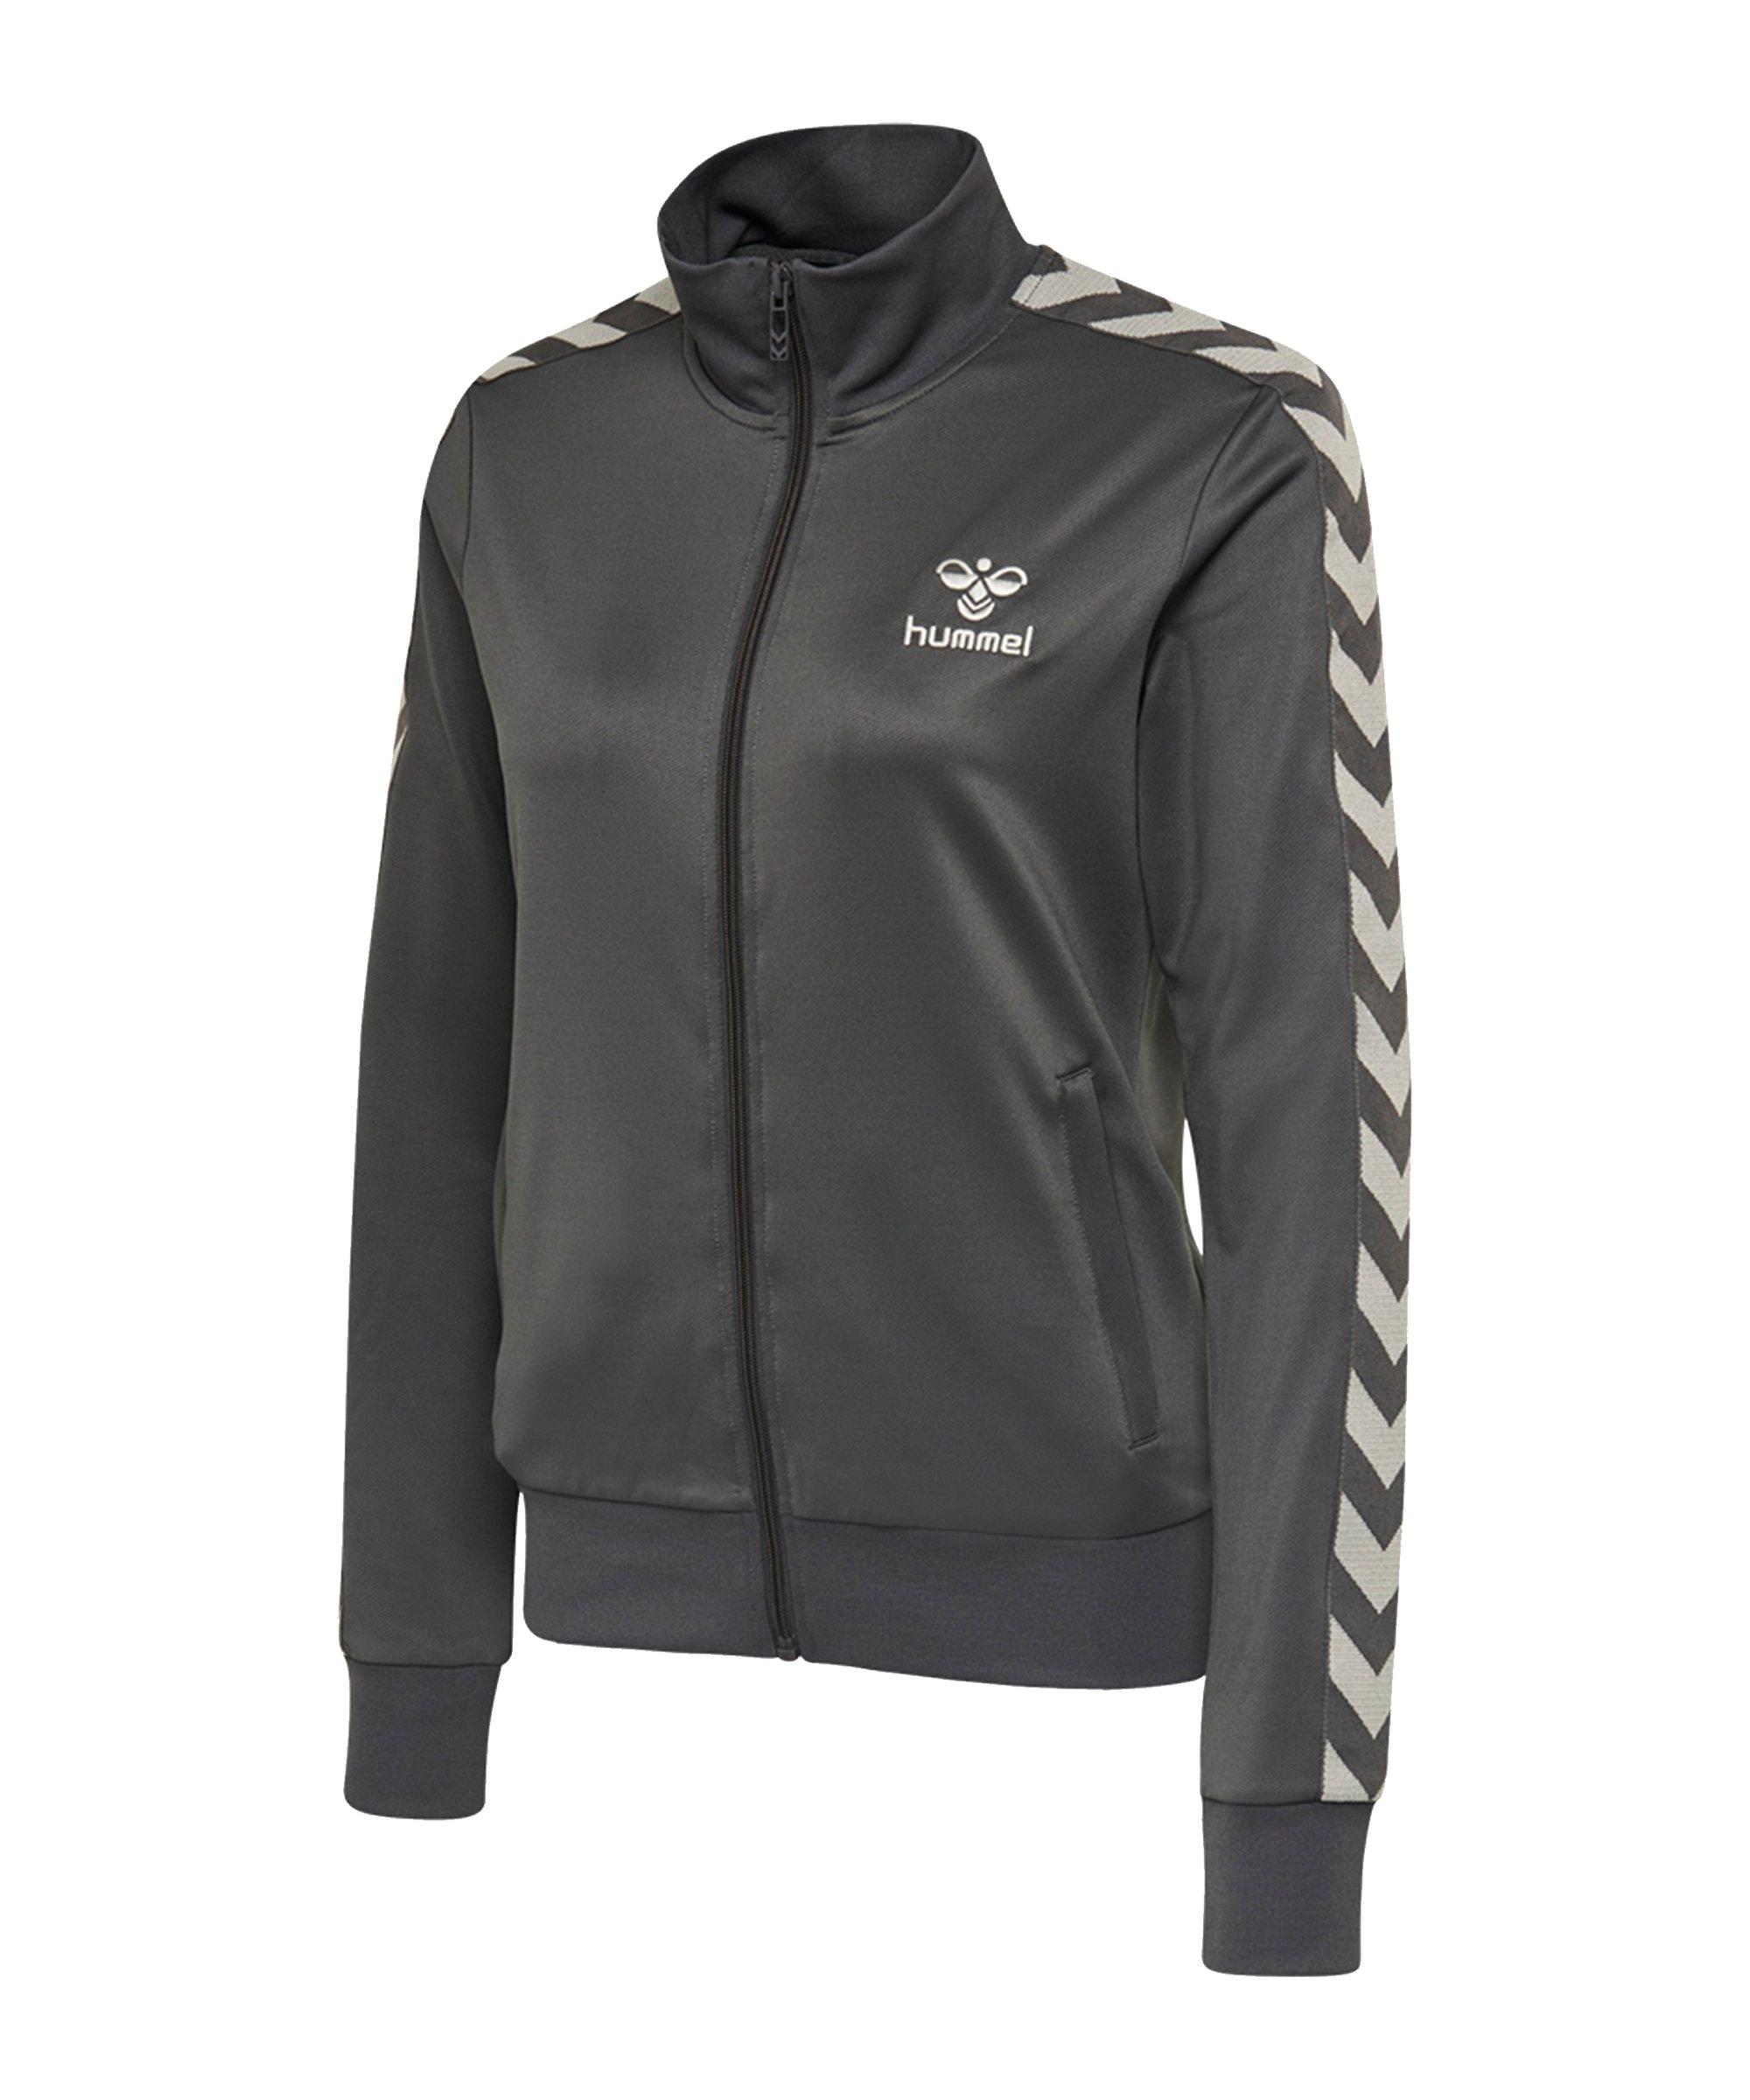 Hummel Nelly Zip Trainingsjacke Damen Grau F1025 - grau